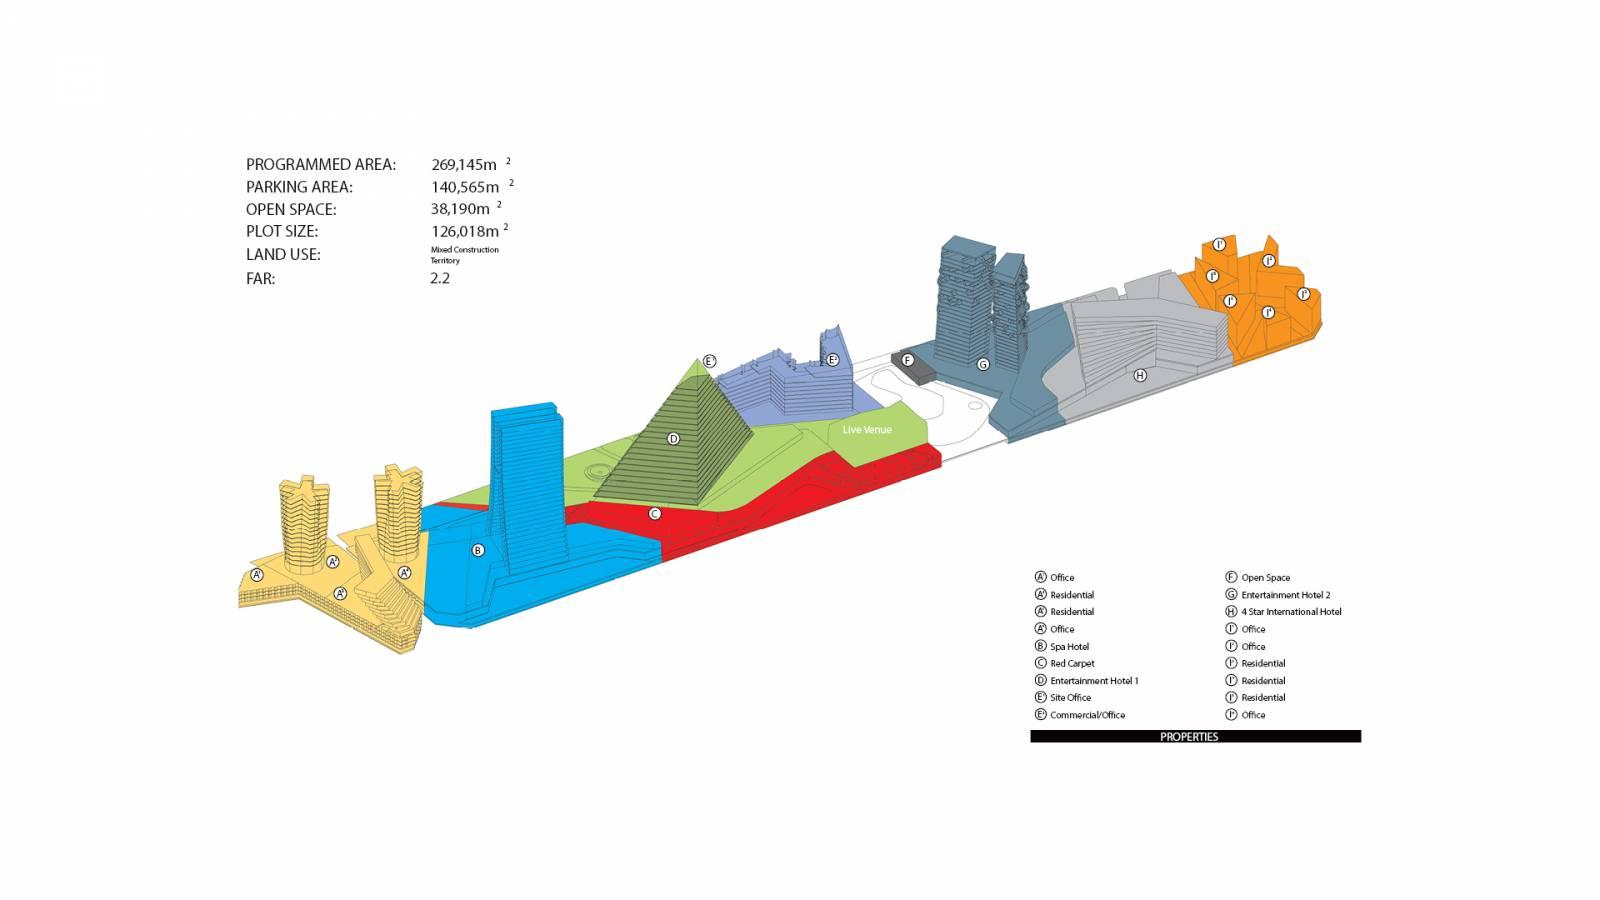 PROPERTY ANALISES - Zakusala - SPOL Architects